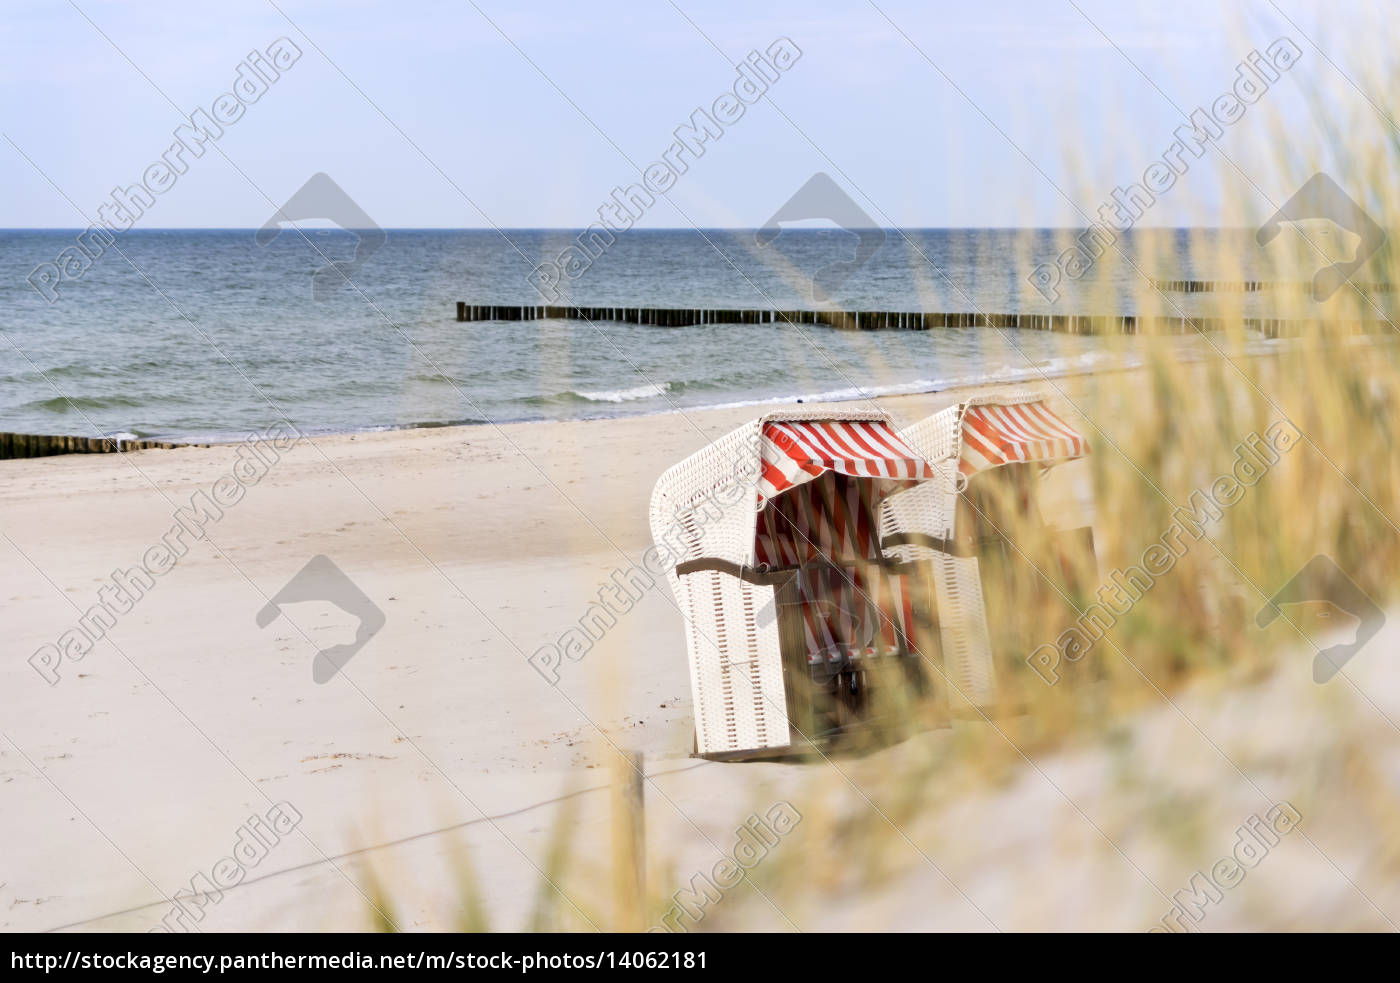 dune, grass, on, baltic, sea, beach - 14062181